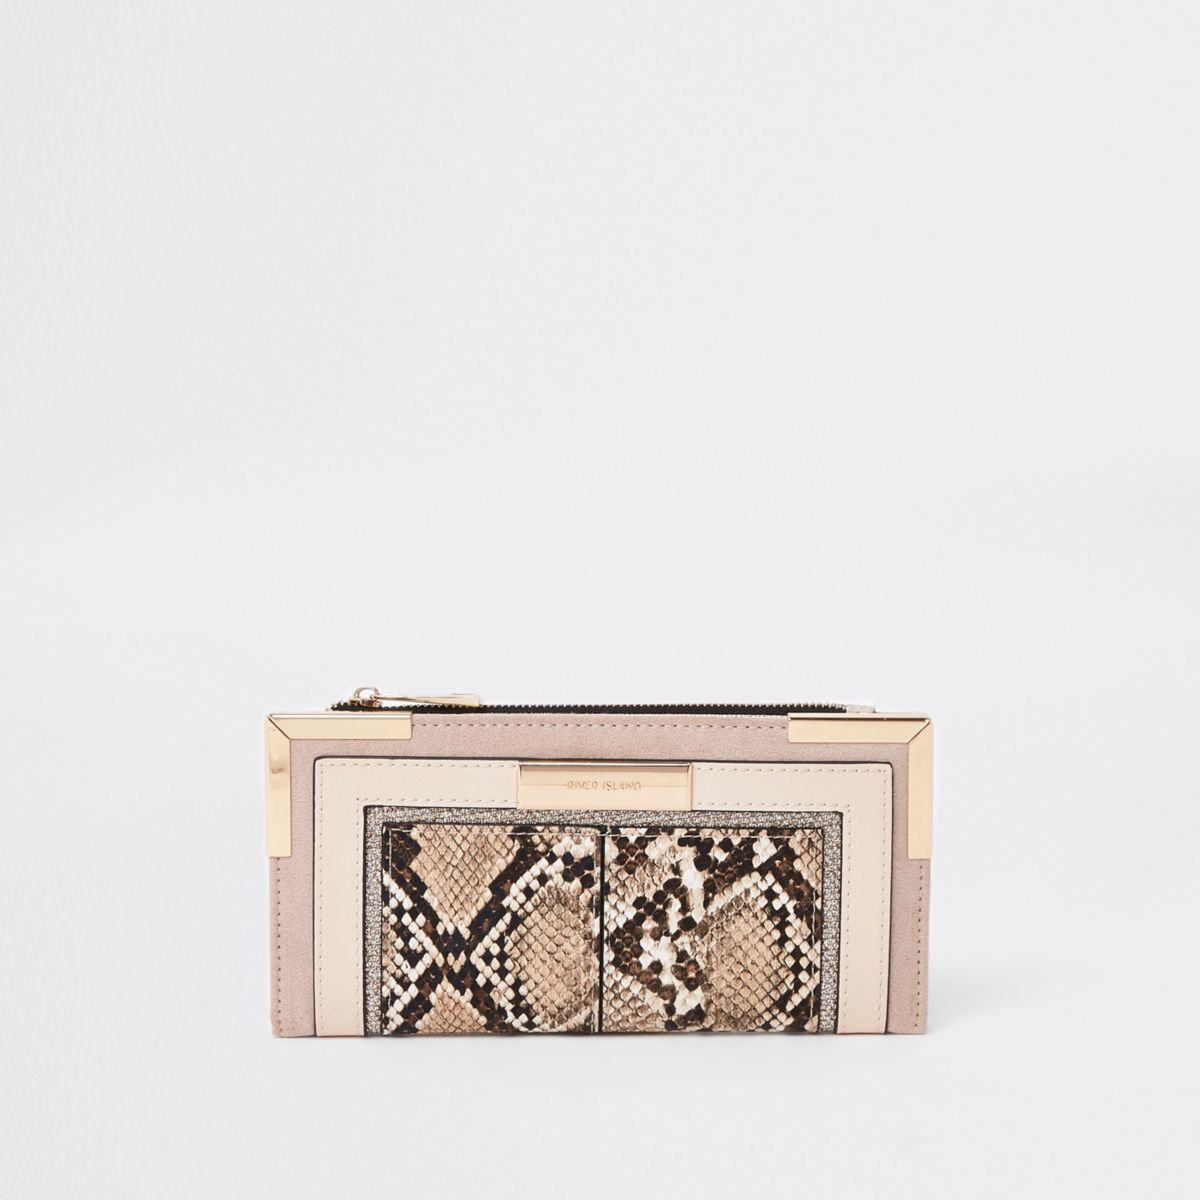 Light biege snake embossed foldout purse